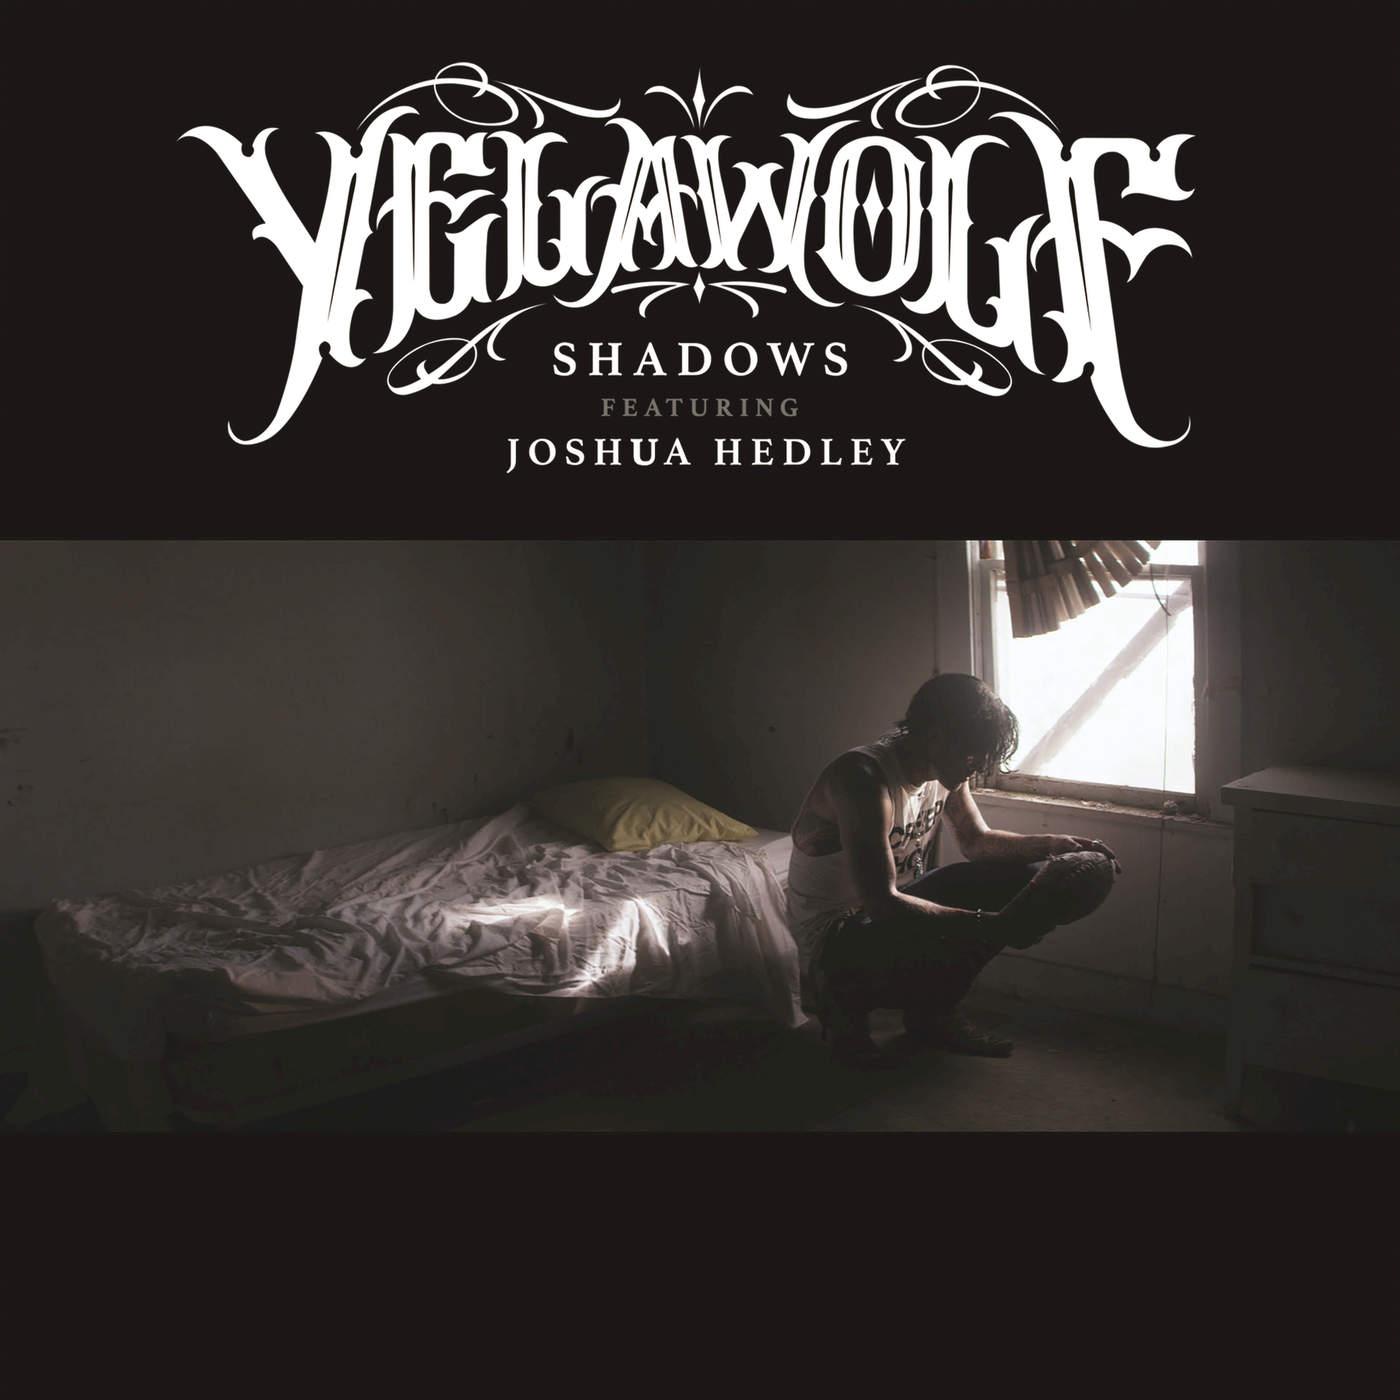 Yelawolf - Shadows (feat. Joshua Hedley) - Single Cover